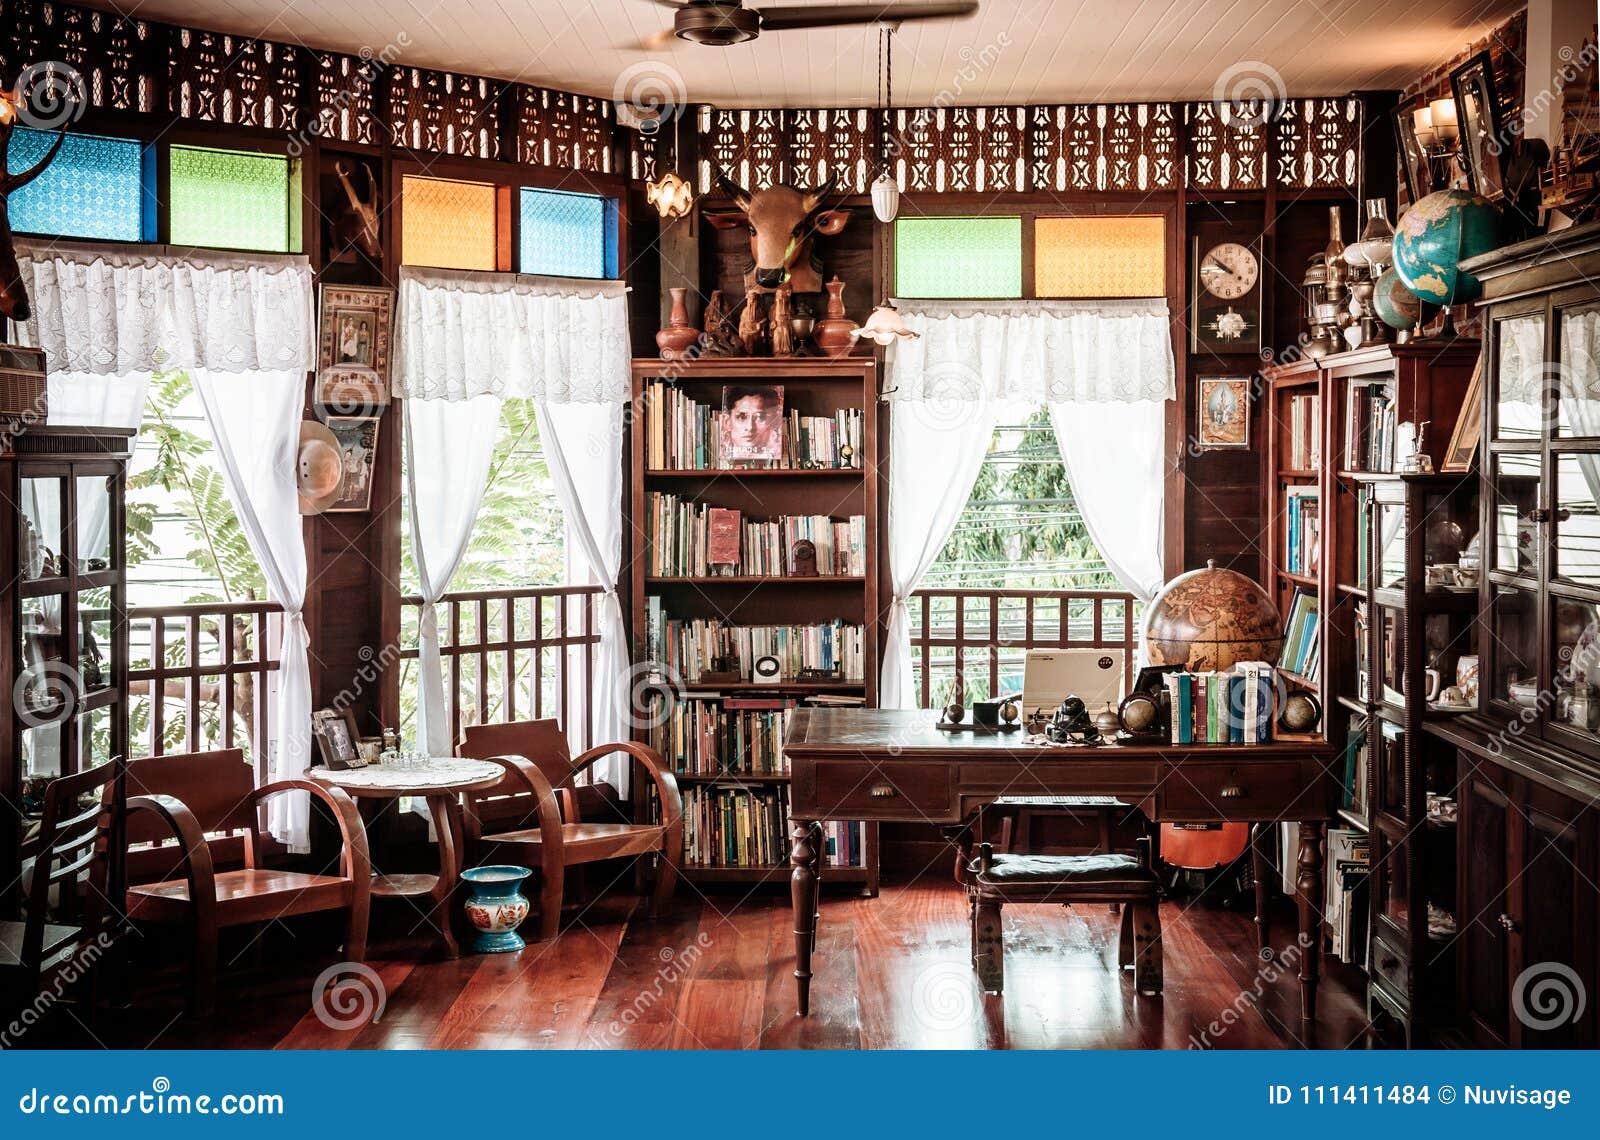 rustic wooden vintage furniture country house interior. Black Bedroom Furniture Sets. Home Design Ideas